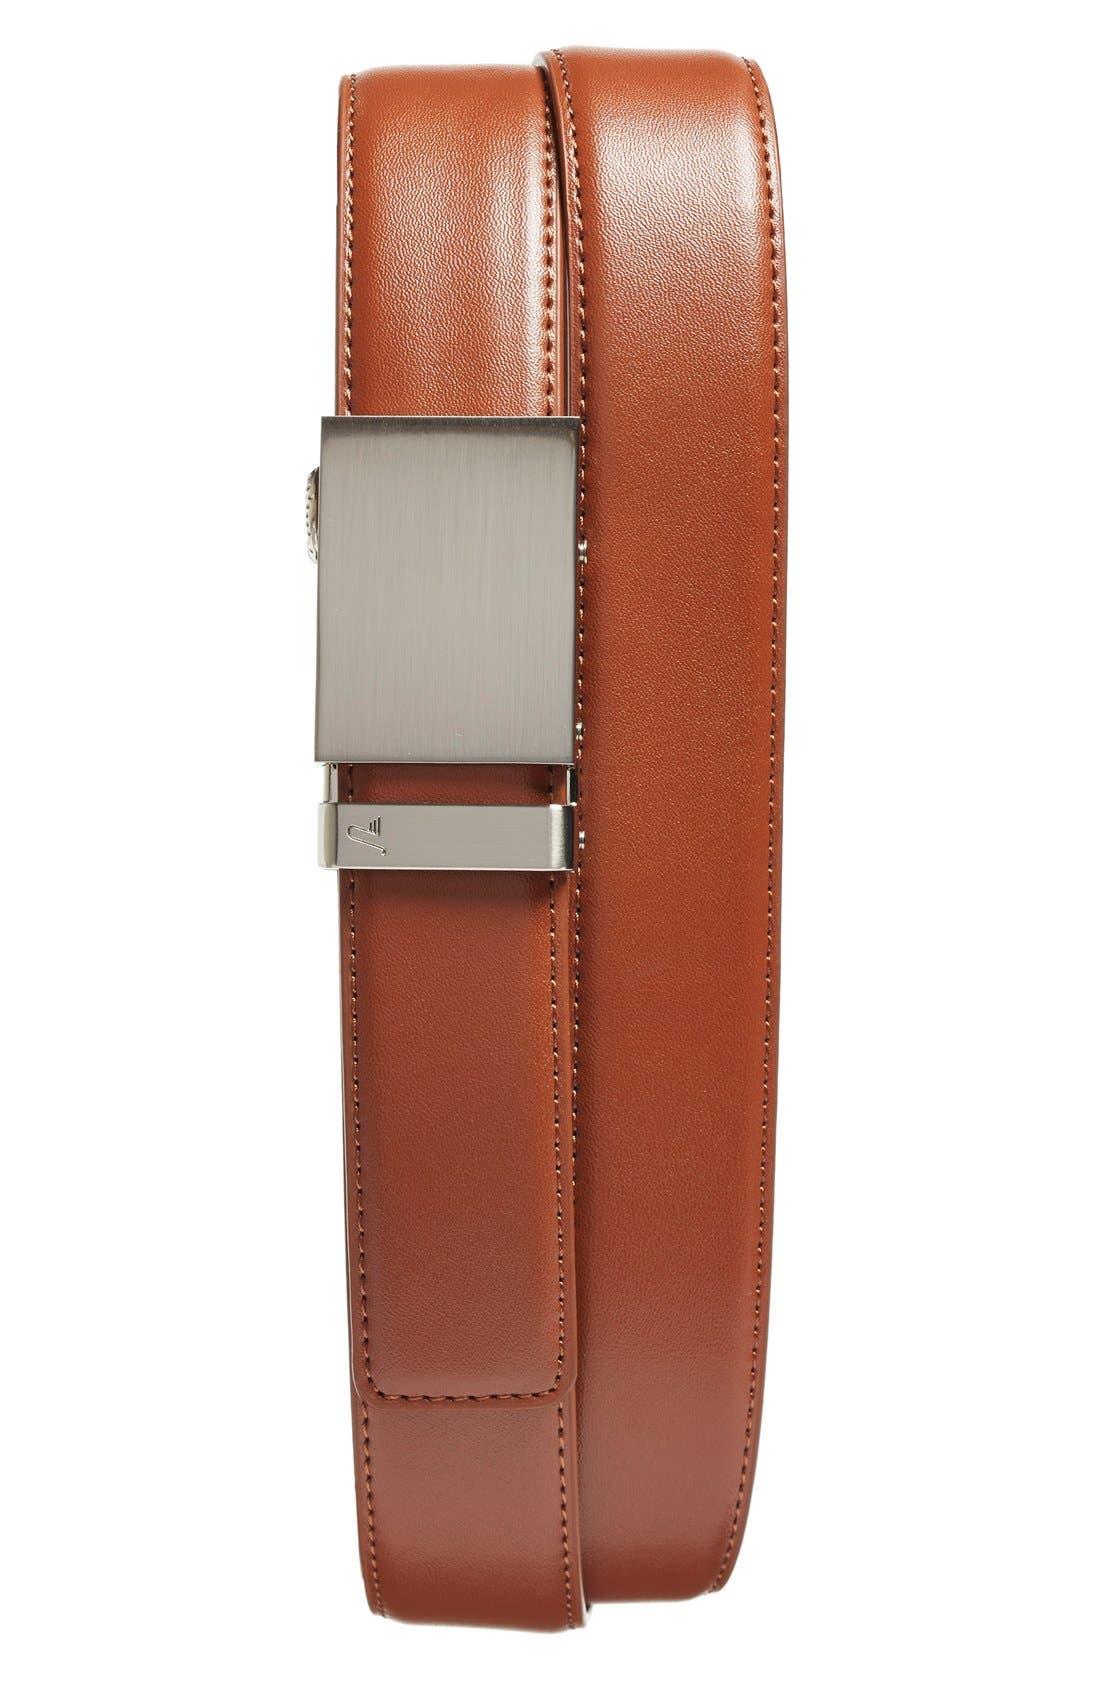 'Steel' Leather Belt,                             Main thumbnail 1, color,                             STEEL/ SADDLE BROWN